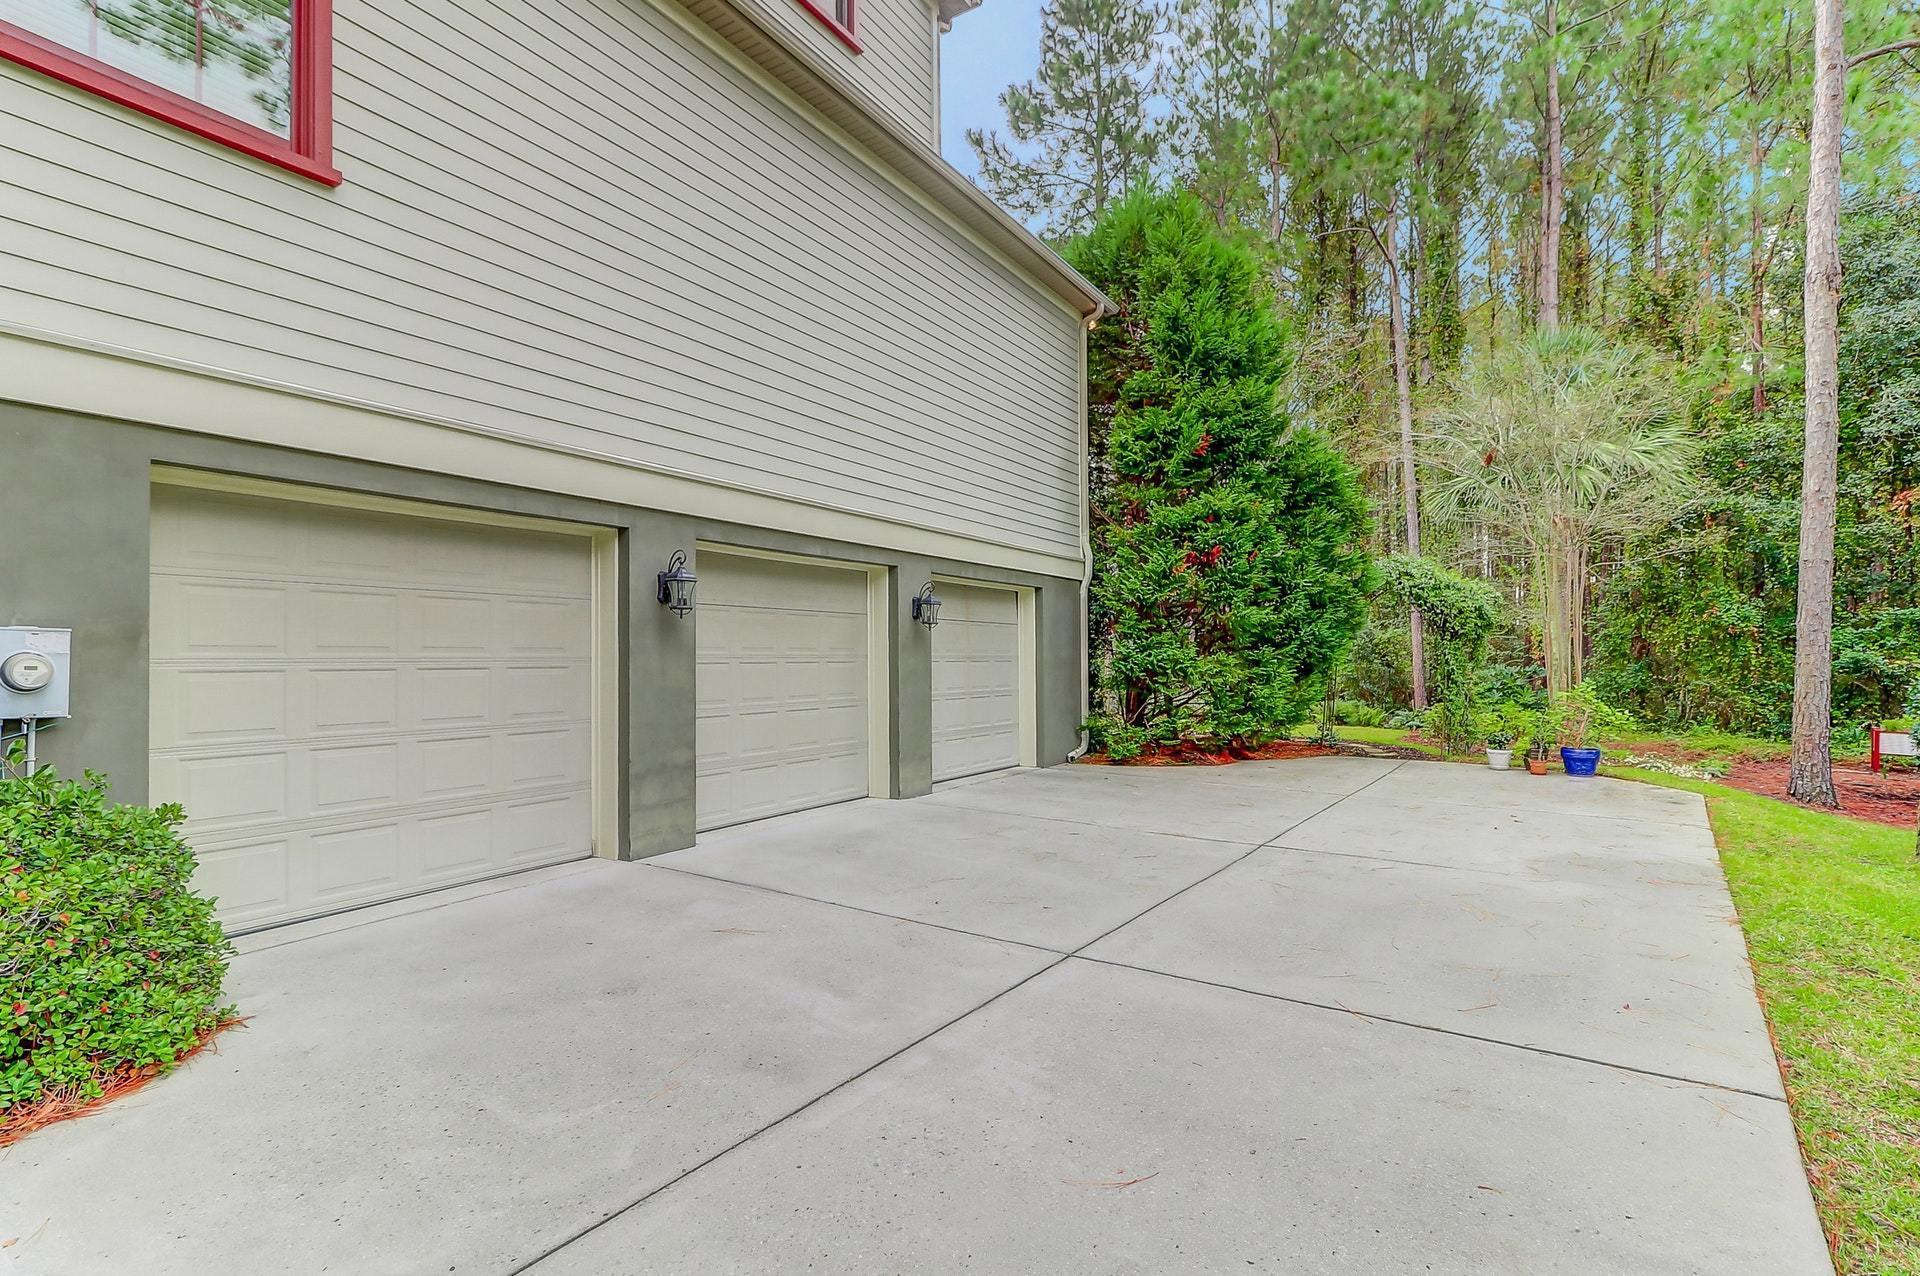 Back Bay Village Homes For Sale - 301 Indigo Bay, Mount Pleasant, SC - 6